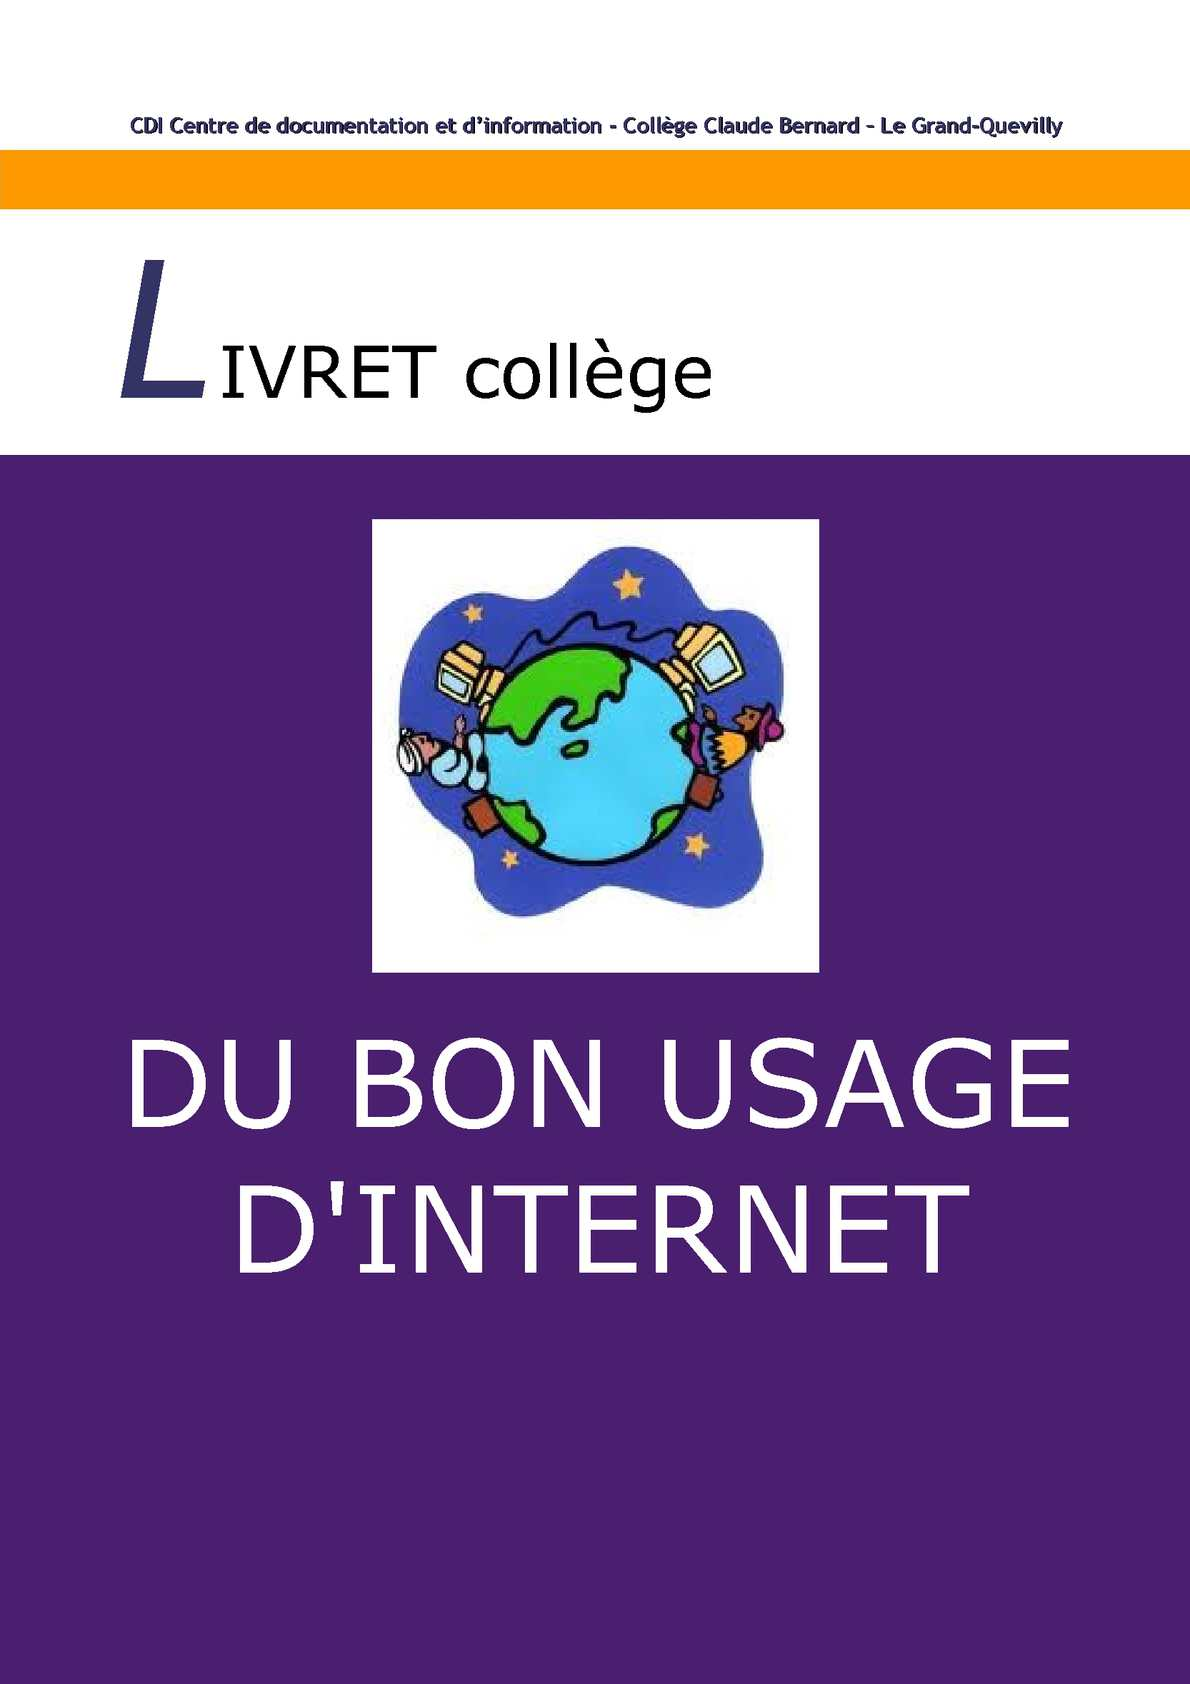 Calam o du bon usage d 39 internet livret coll ge - Centre claude bernard guilherand granges ...